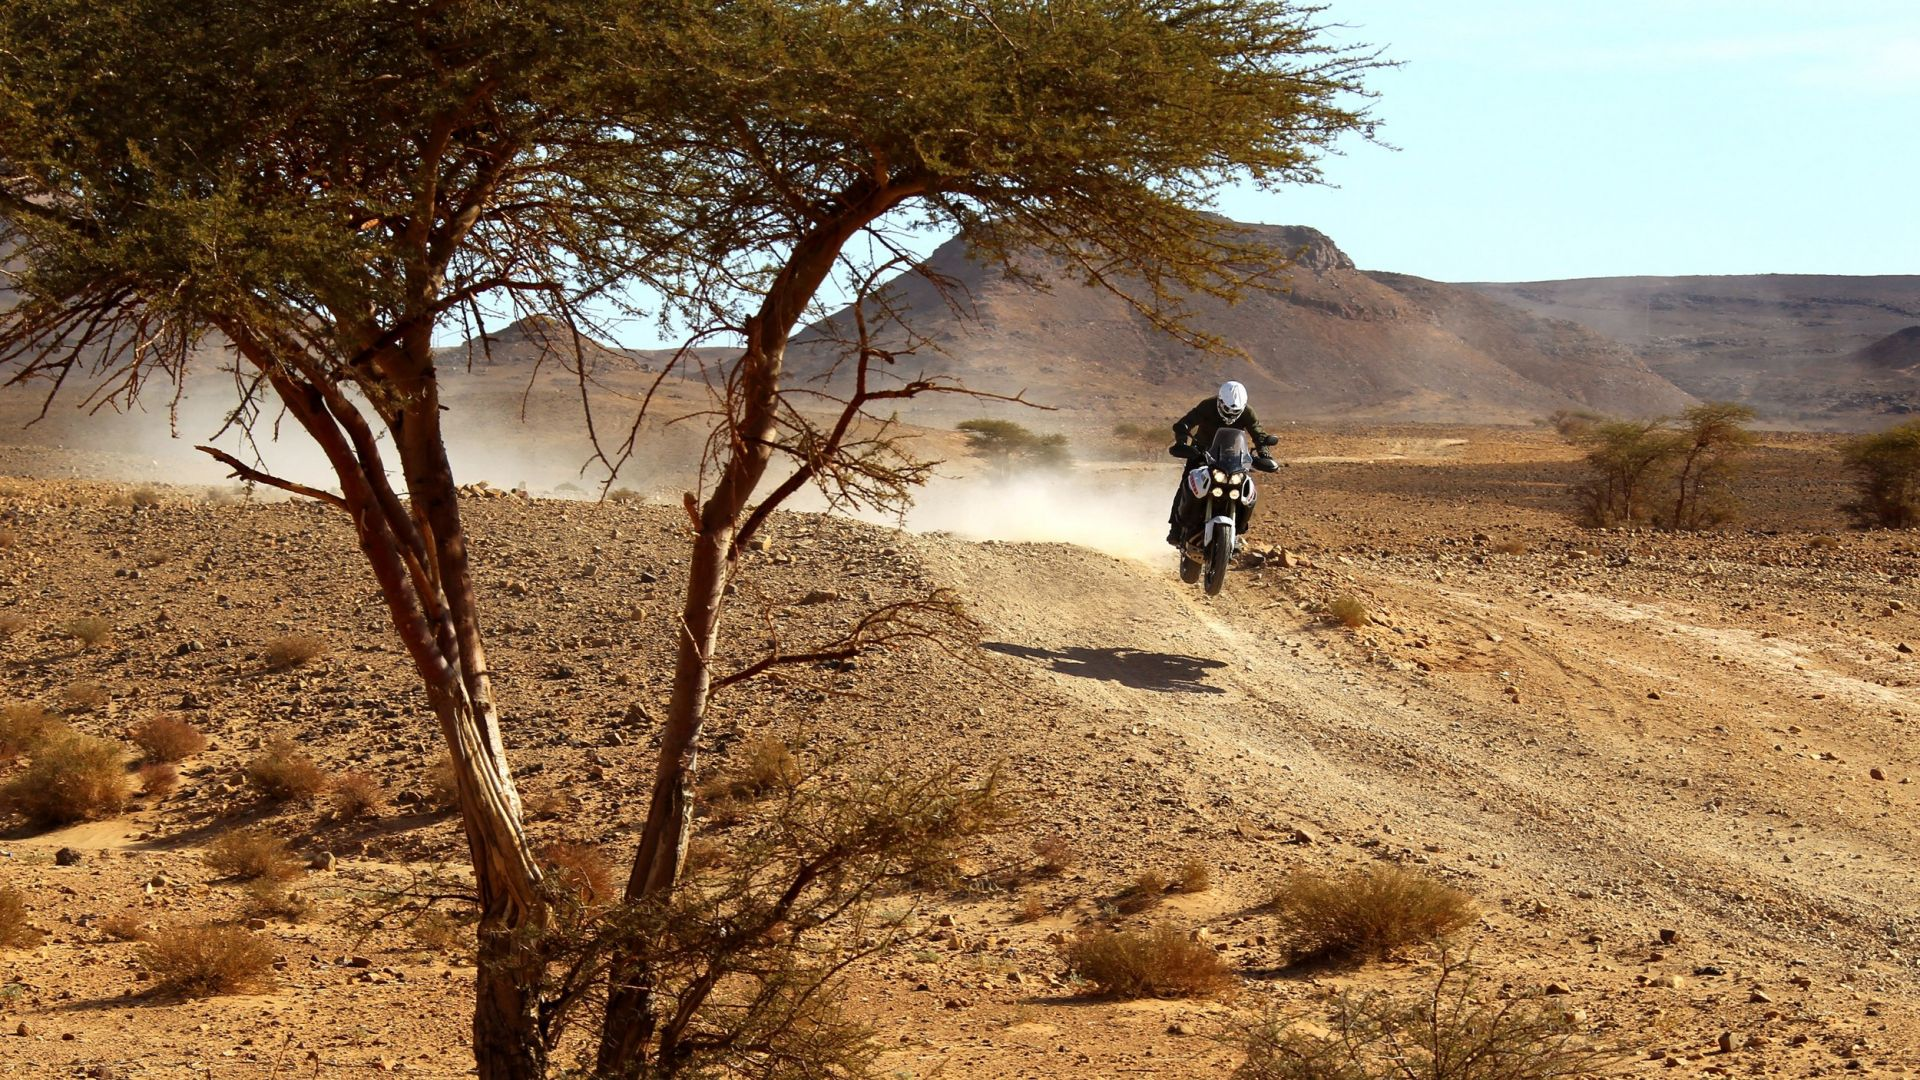 Immagine 67: In Marocco con la Yamaha Super Ténéré